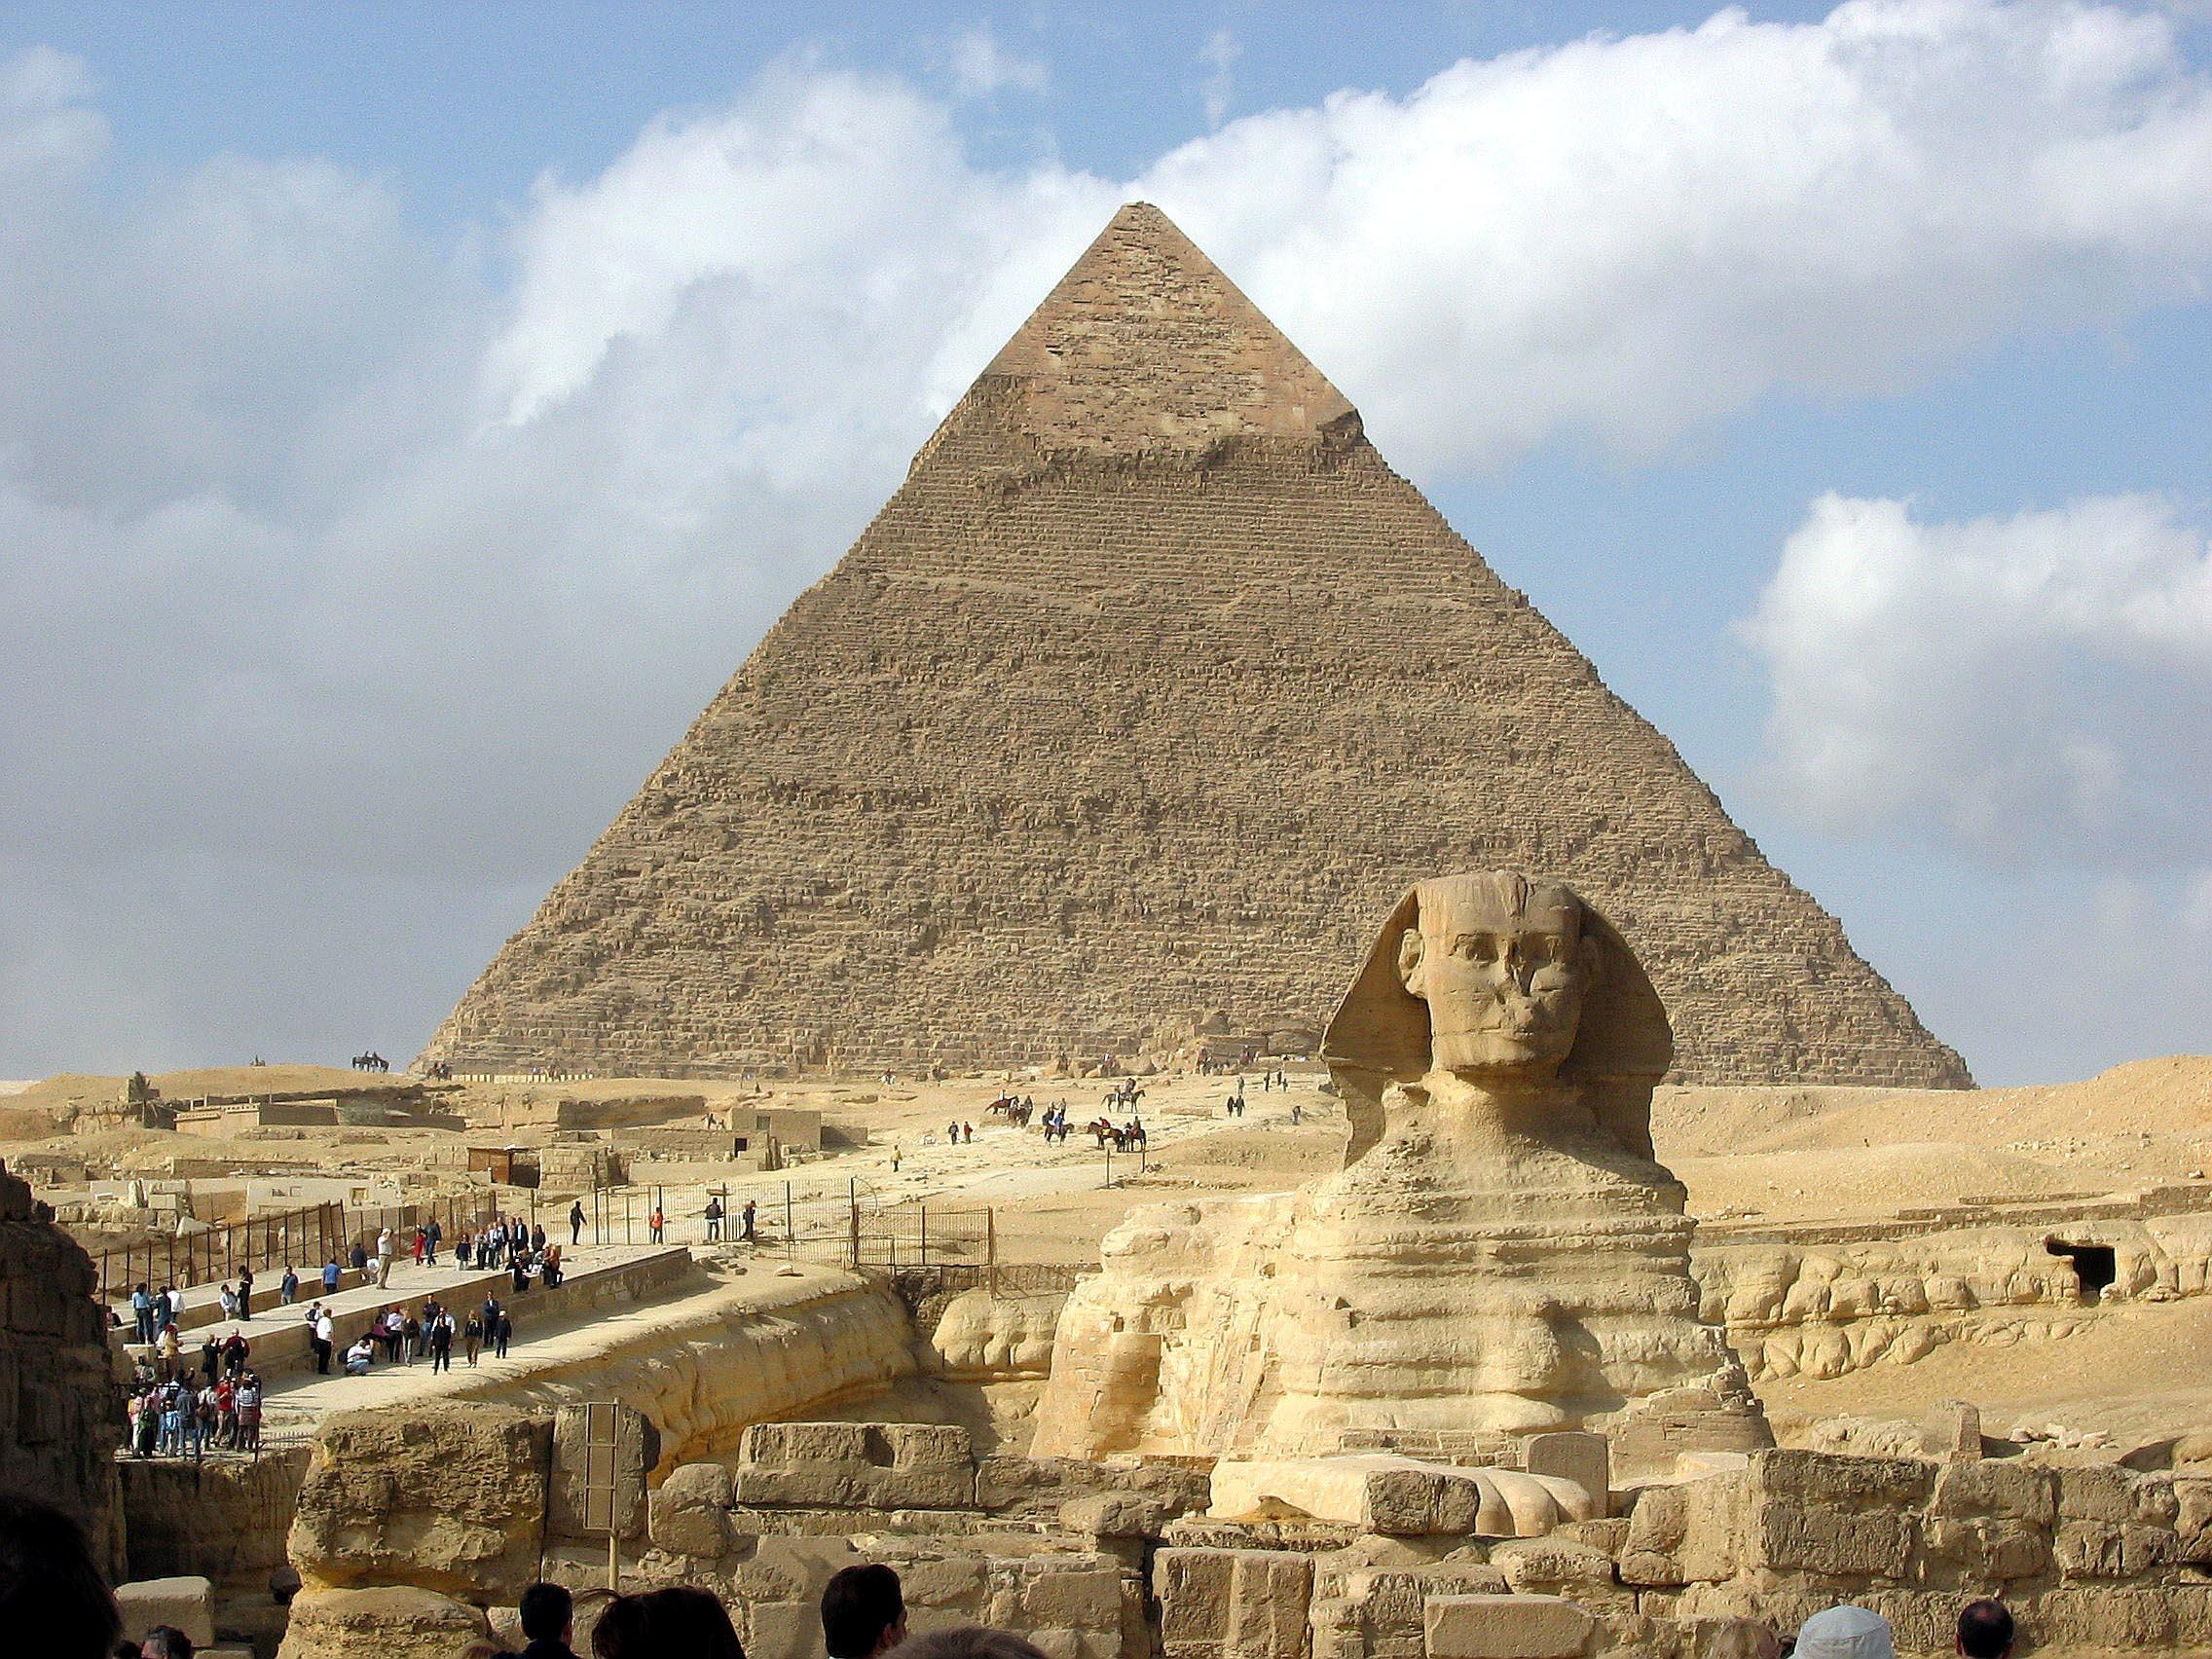 Giza Great Pyramids and Sphinx